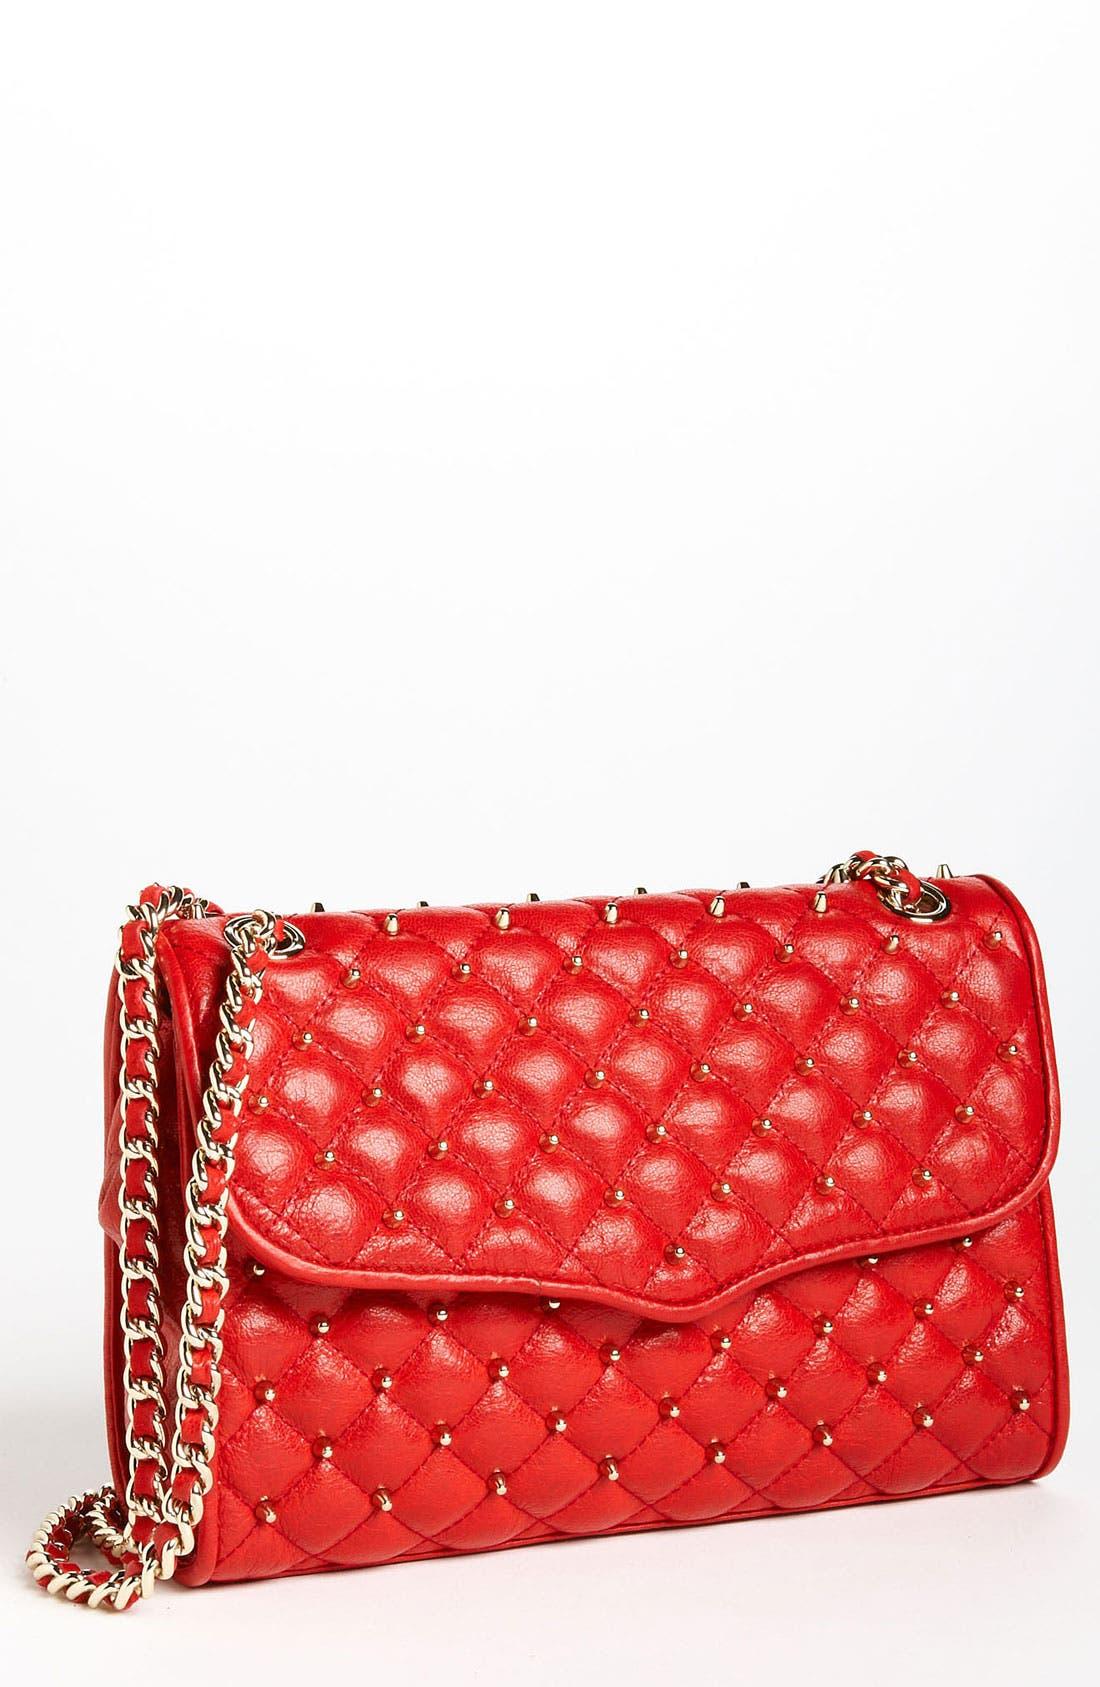 Main Image - Rebecca Minkoff 'Affair' Double Chain Shoulder Bag